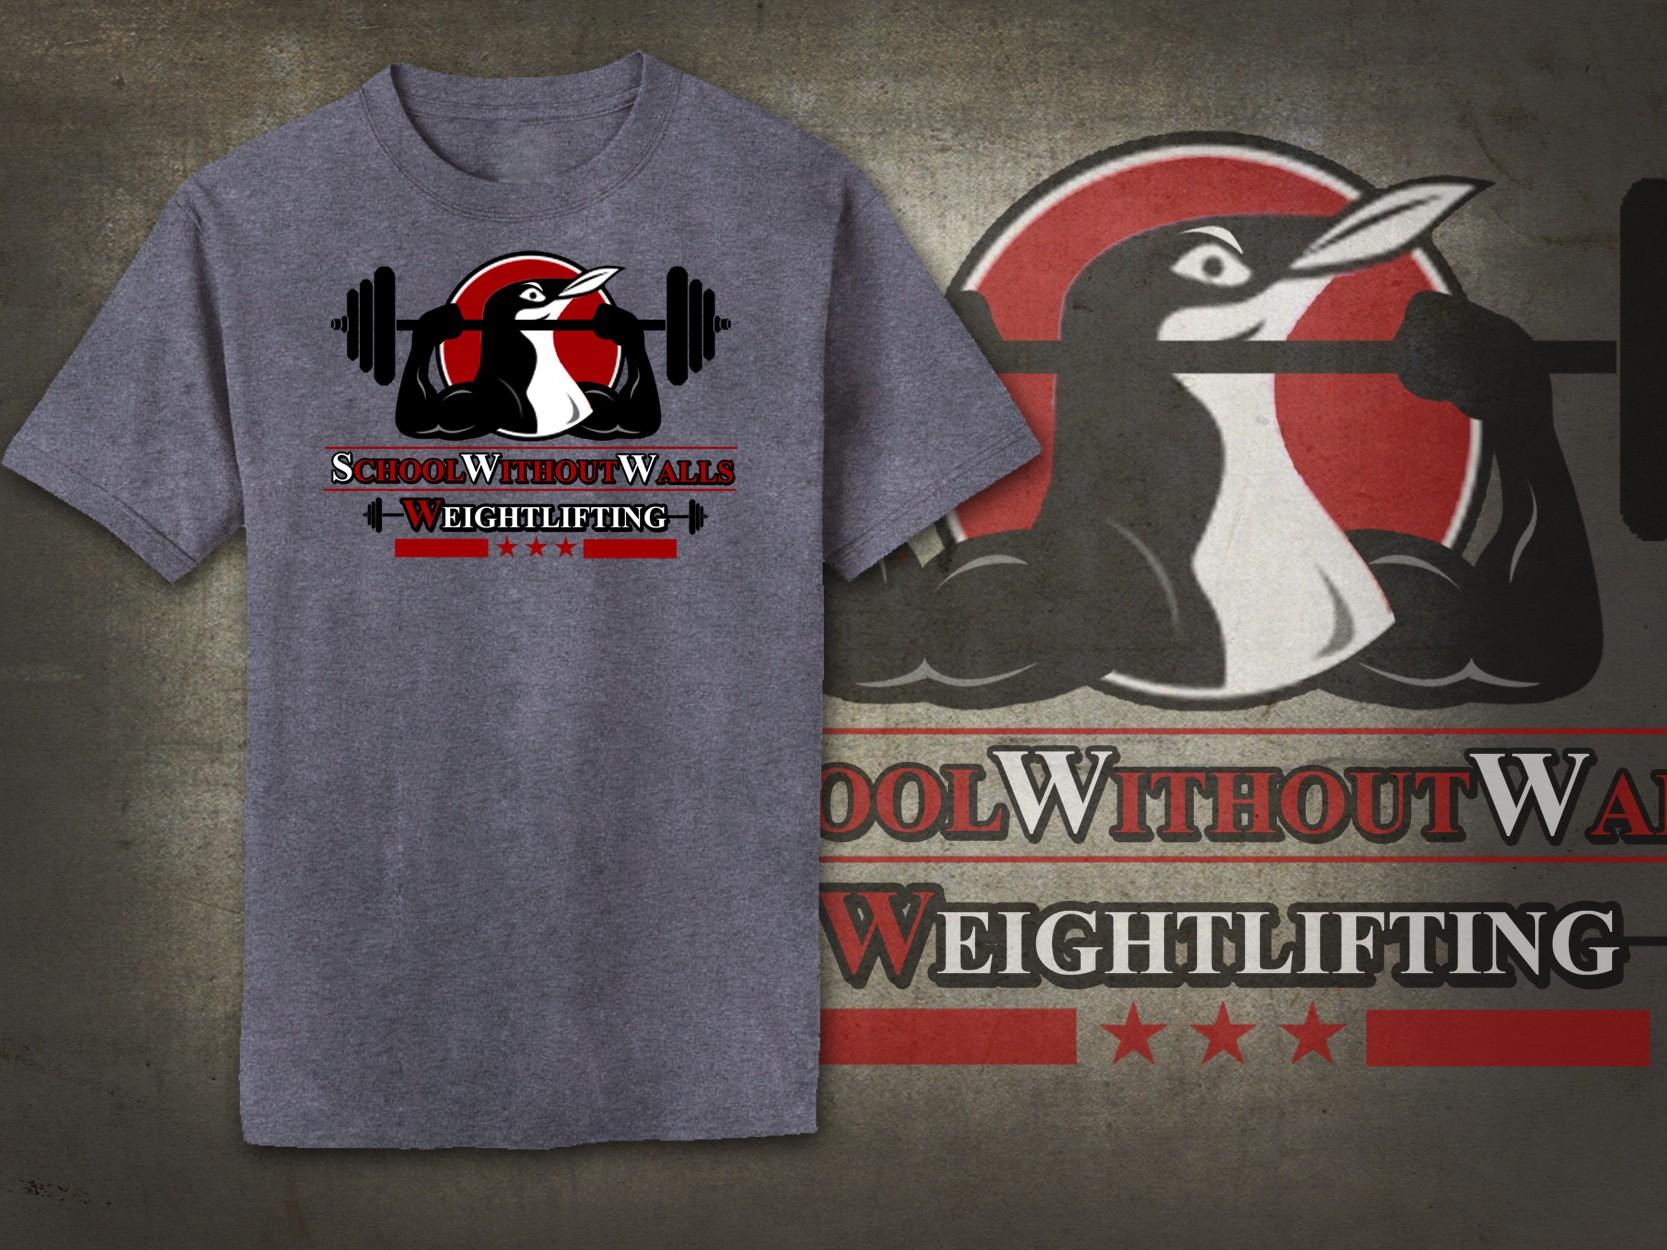 High School Weightlifting Club needs shirt!